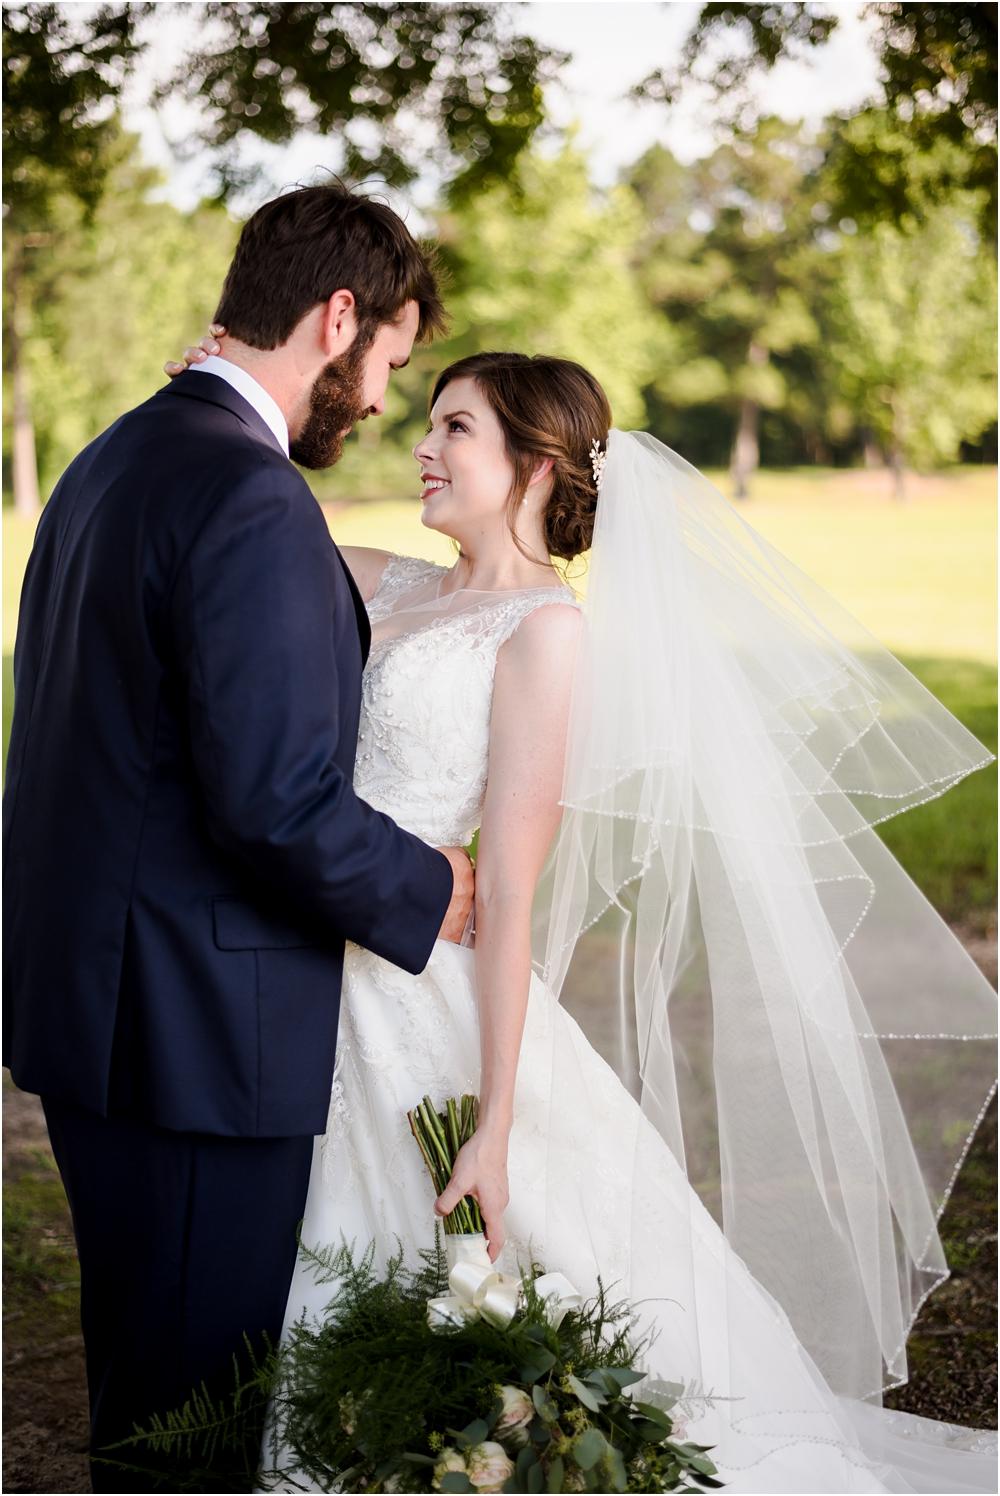 marianna-florida-wedding-photographer-kiersten-grant-63.jpg